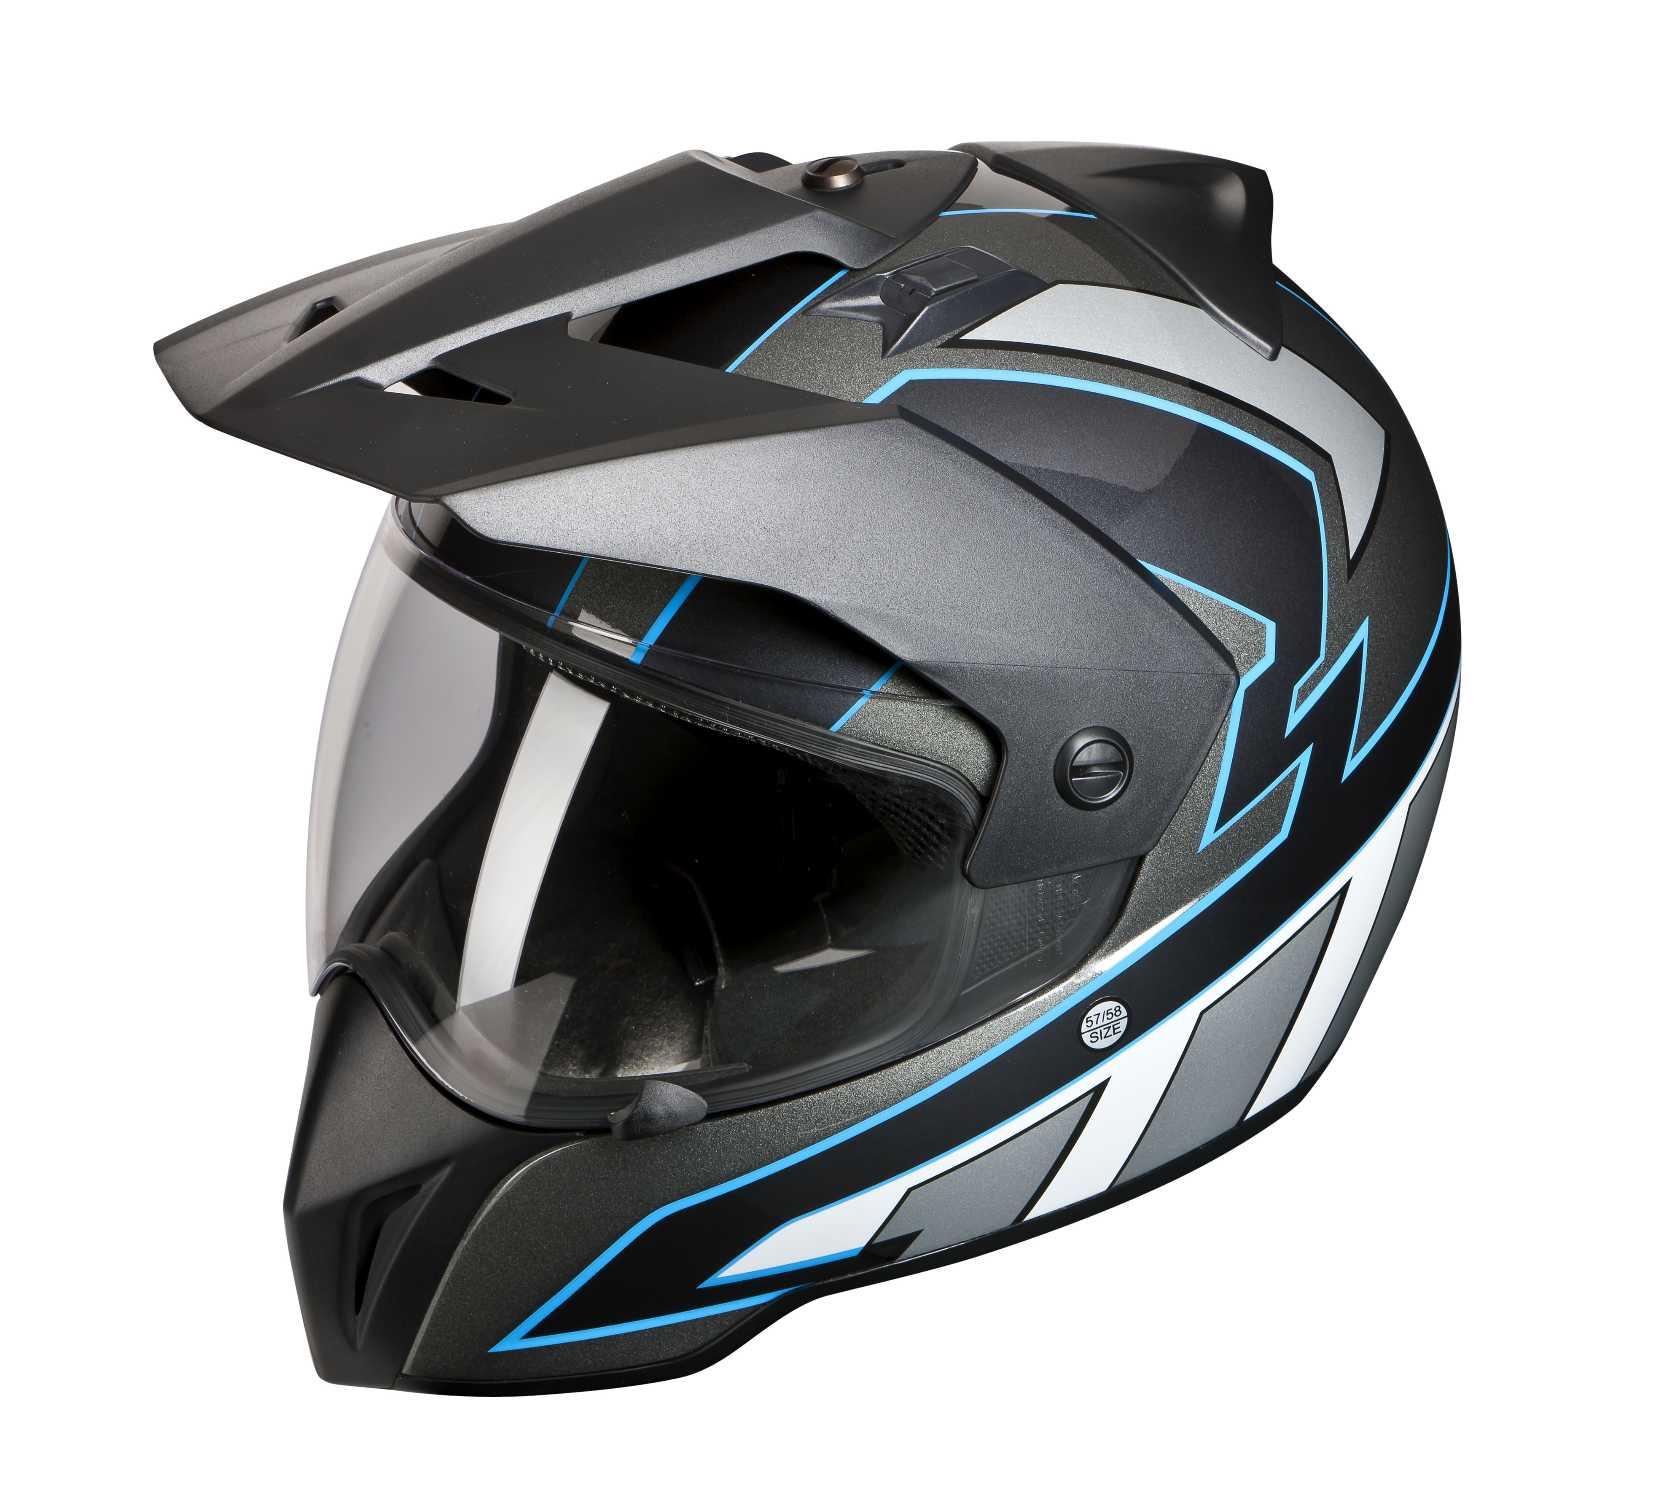 bmw motorrad ride 2013 enduro helmet 09 2012. Black Bedroom Furniture Sets. Home Design Ideas